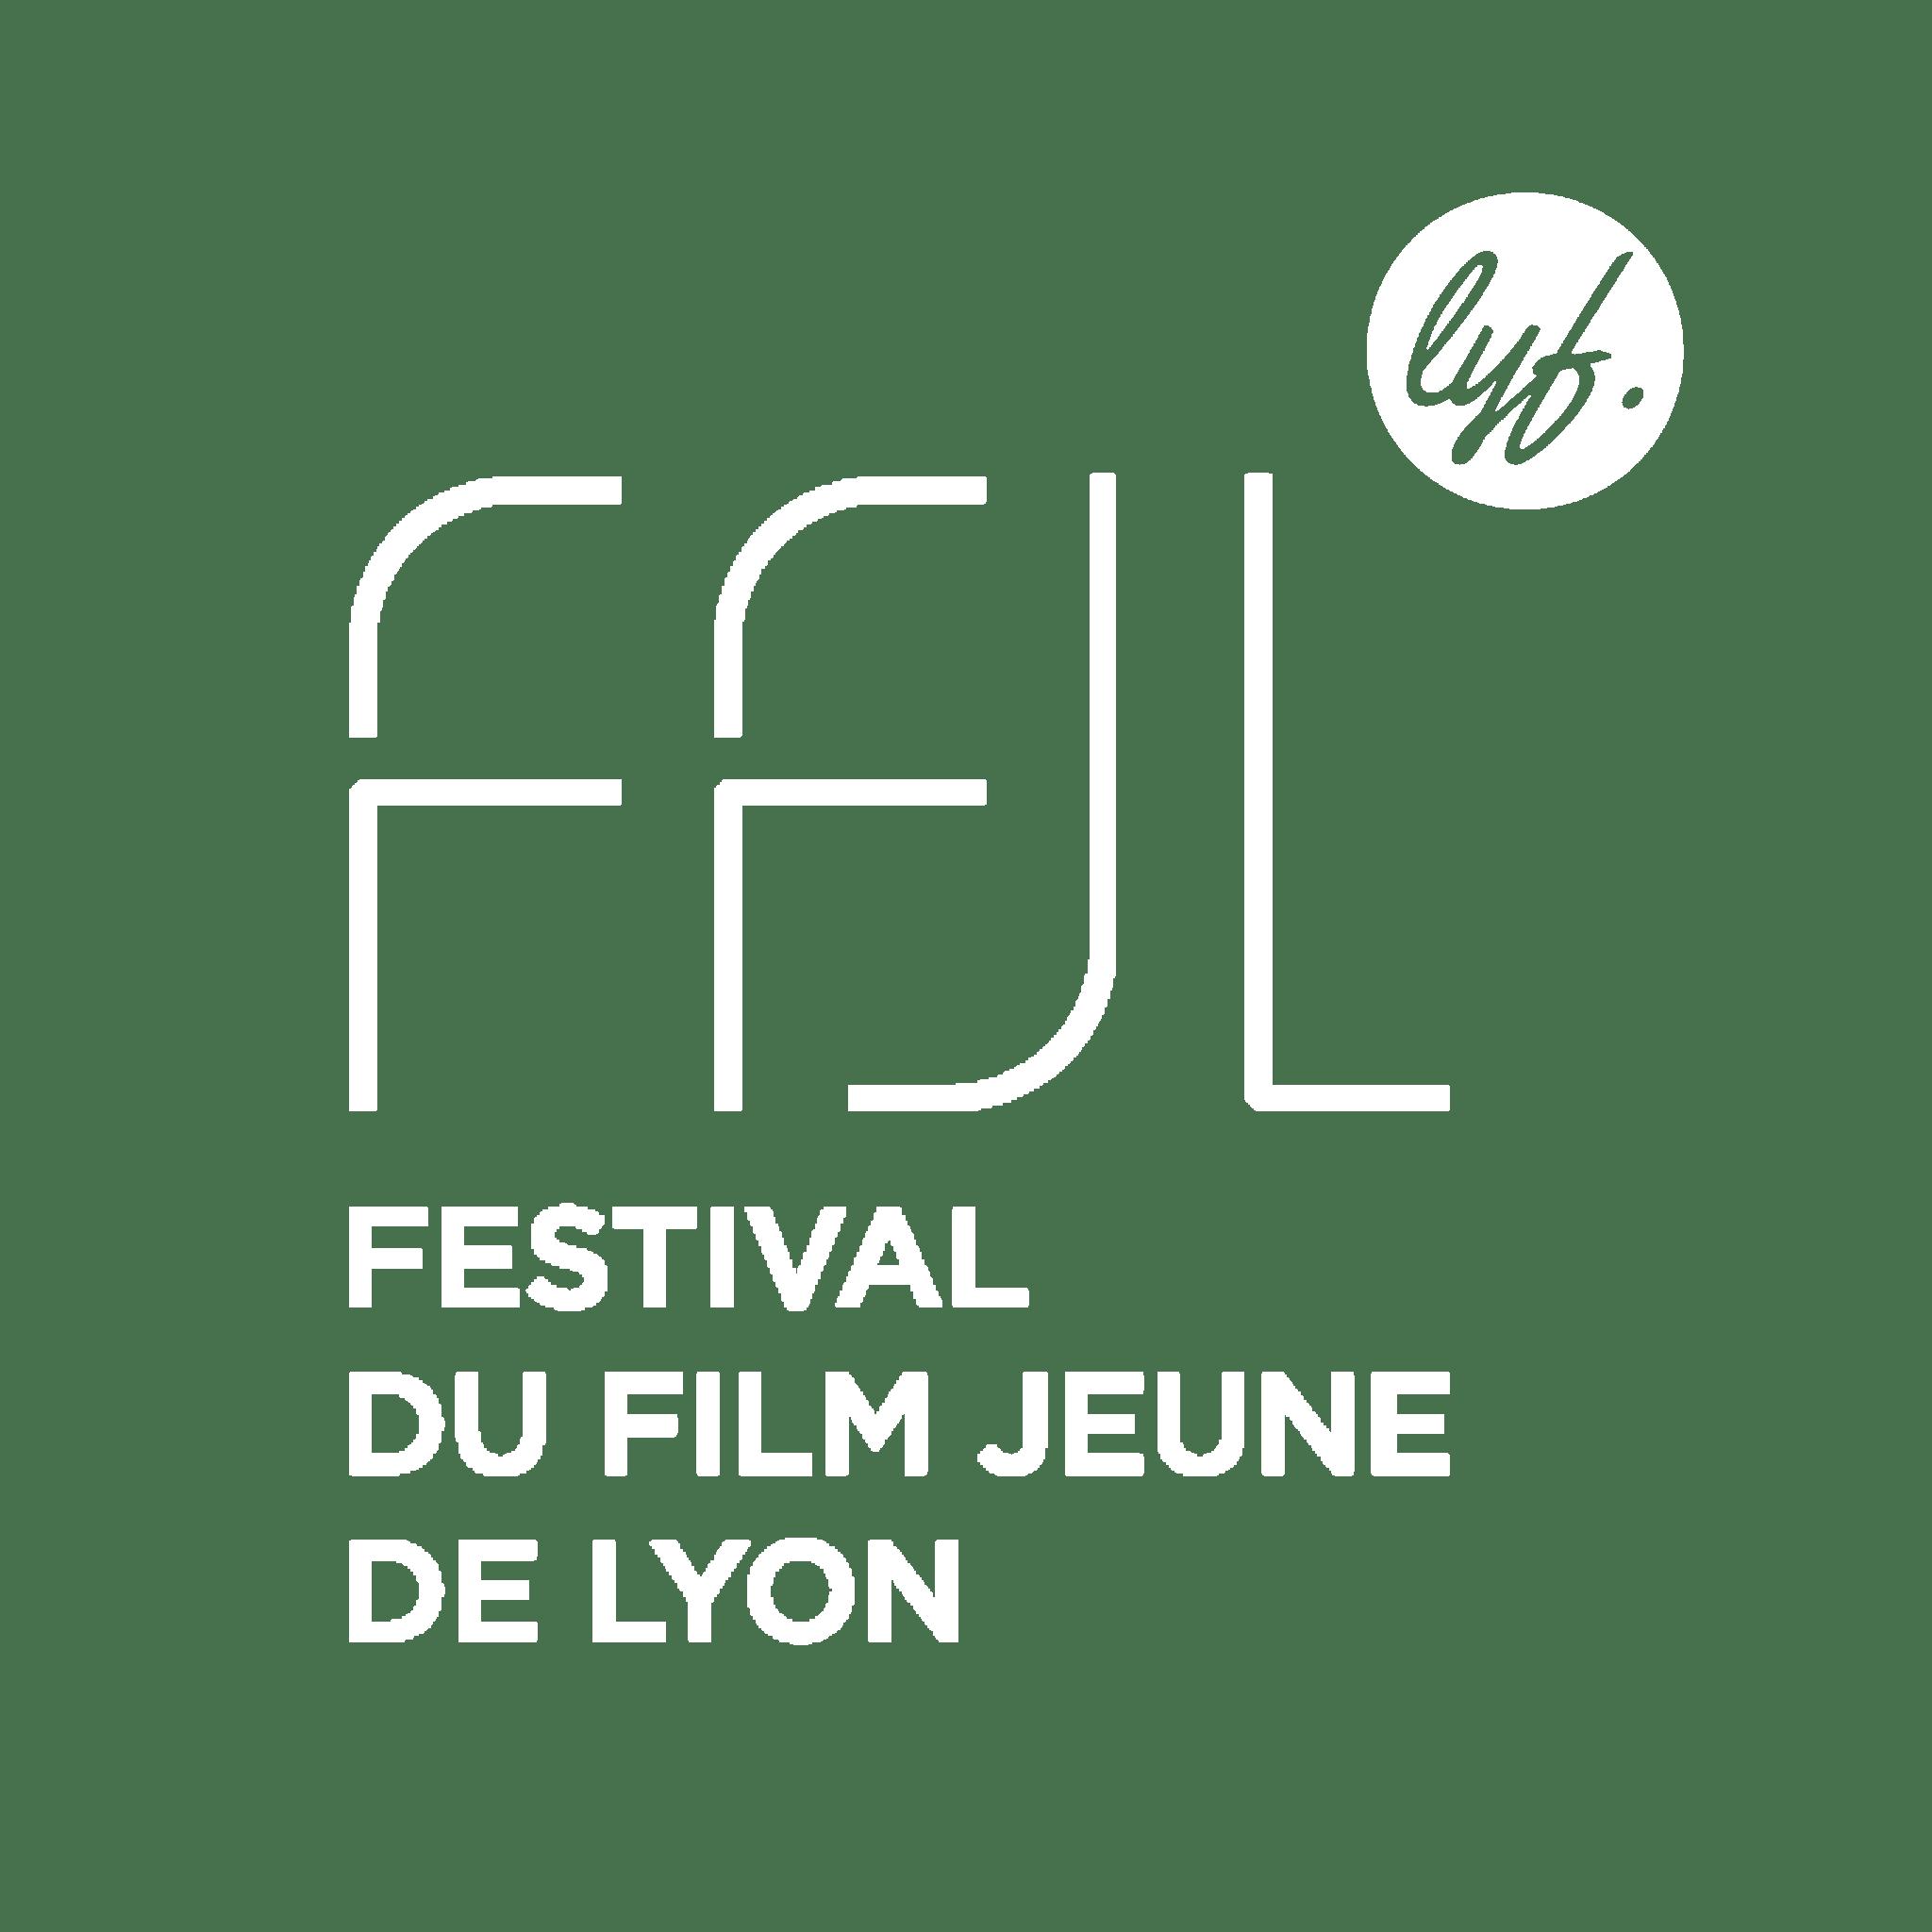 Logo Festival du Film Jeune de Lyon (LYF)